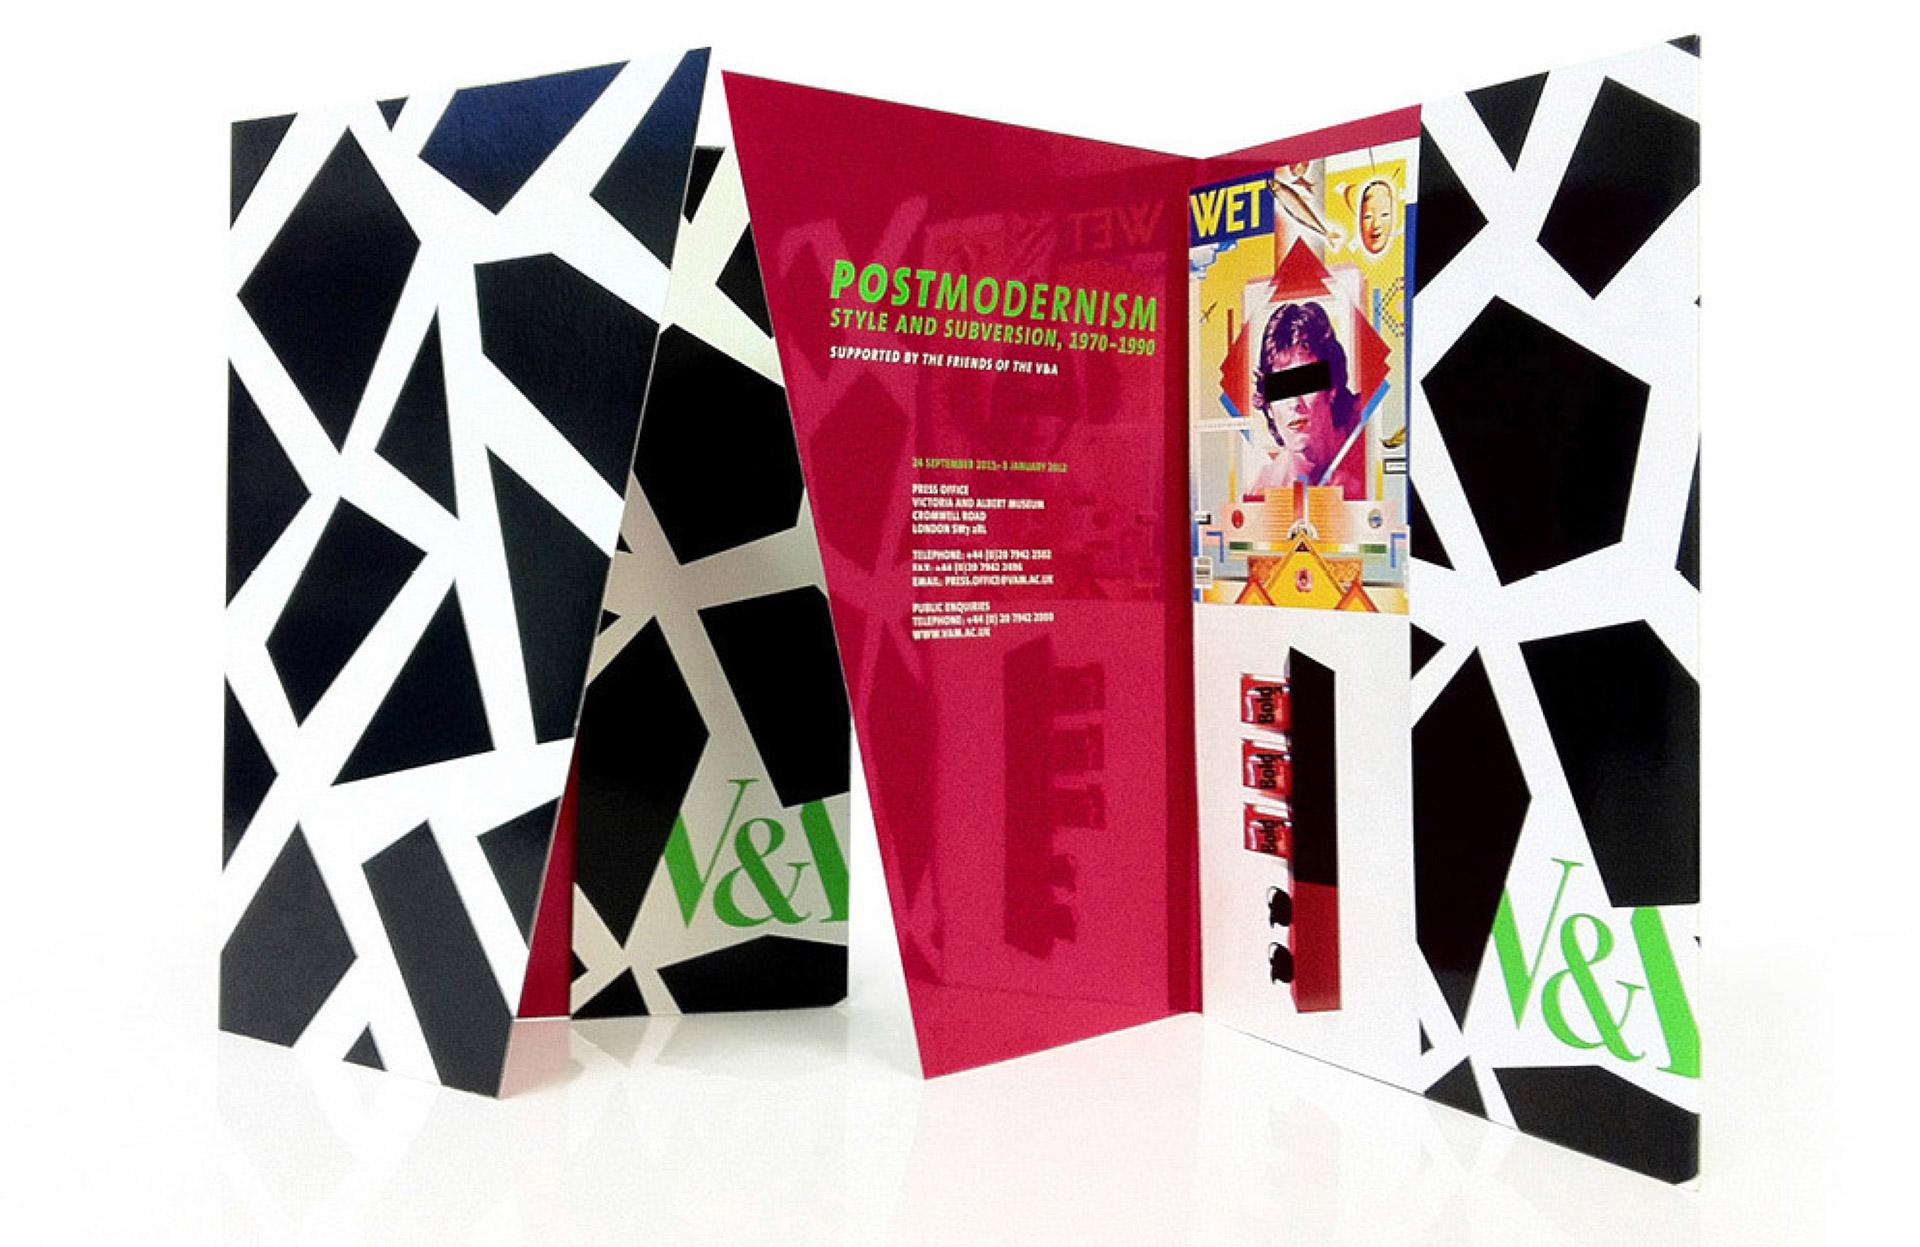 Postmodernism press campaign for V&A South Kensington designed by Irish Butcher